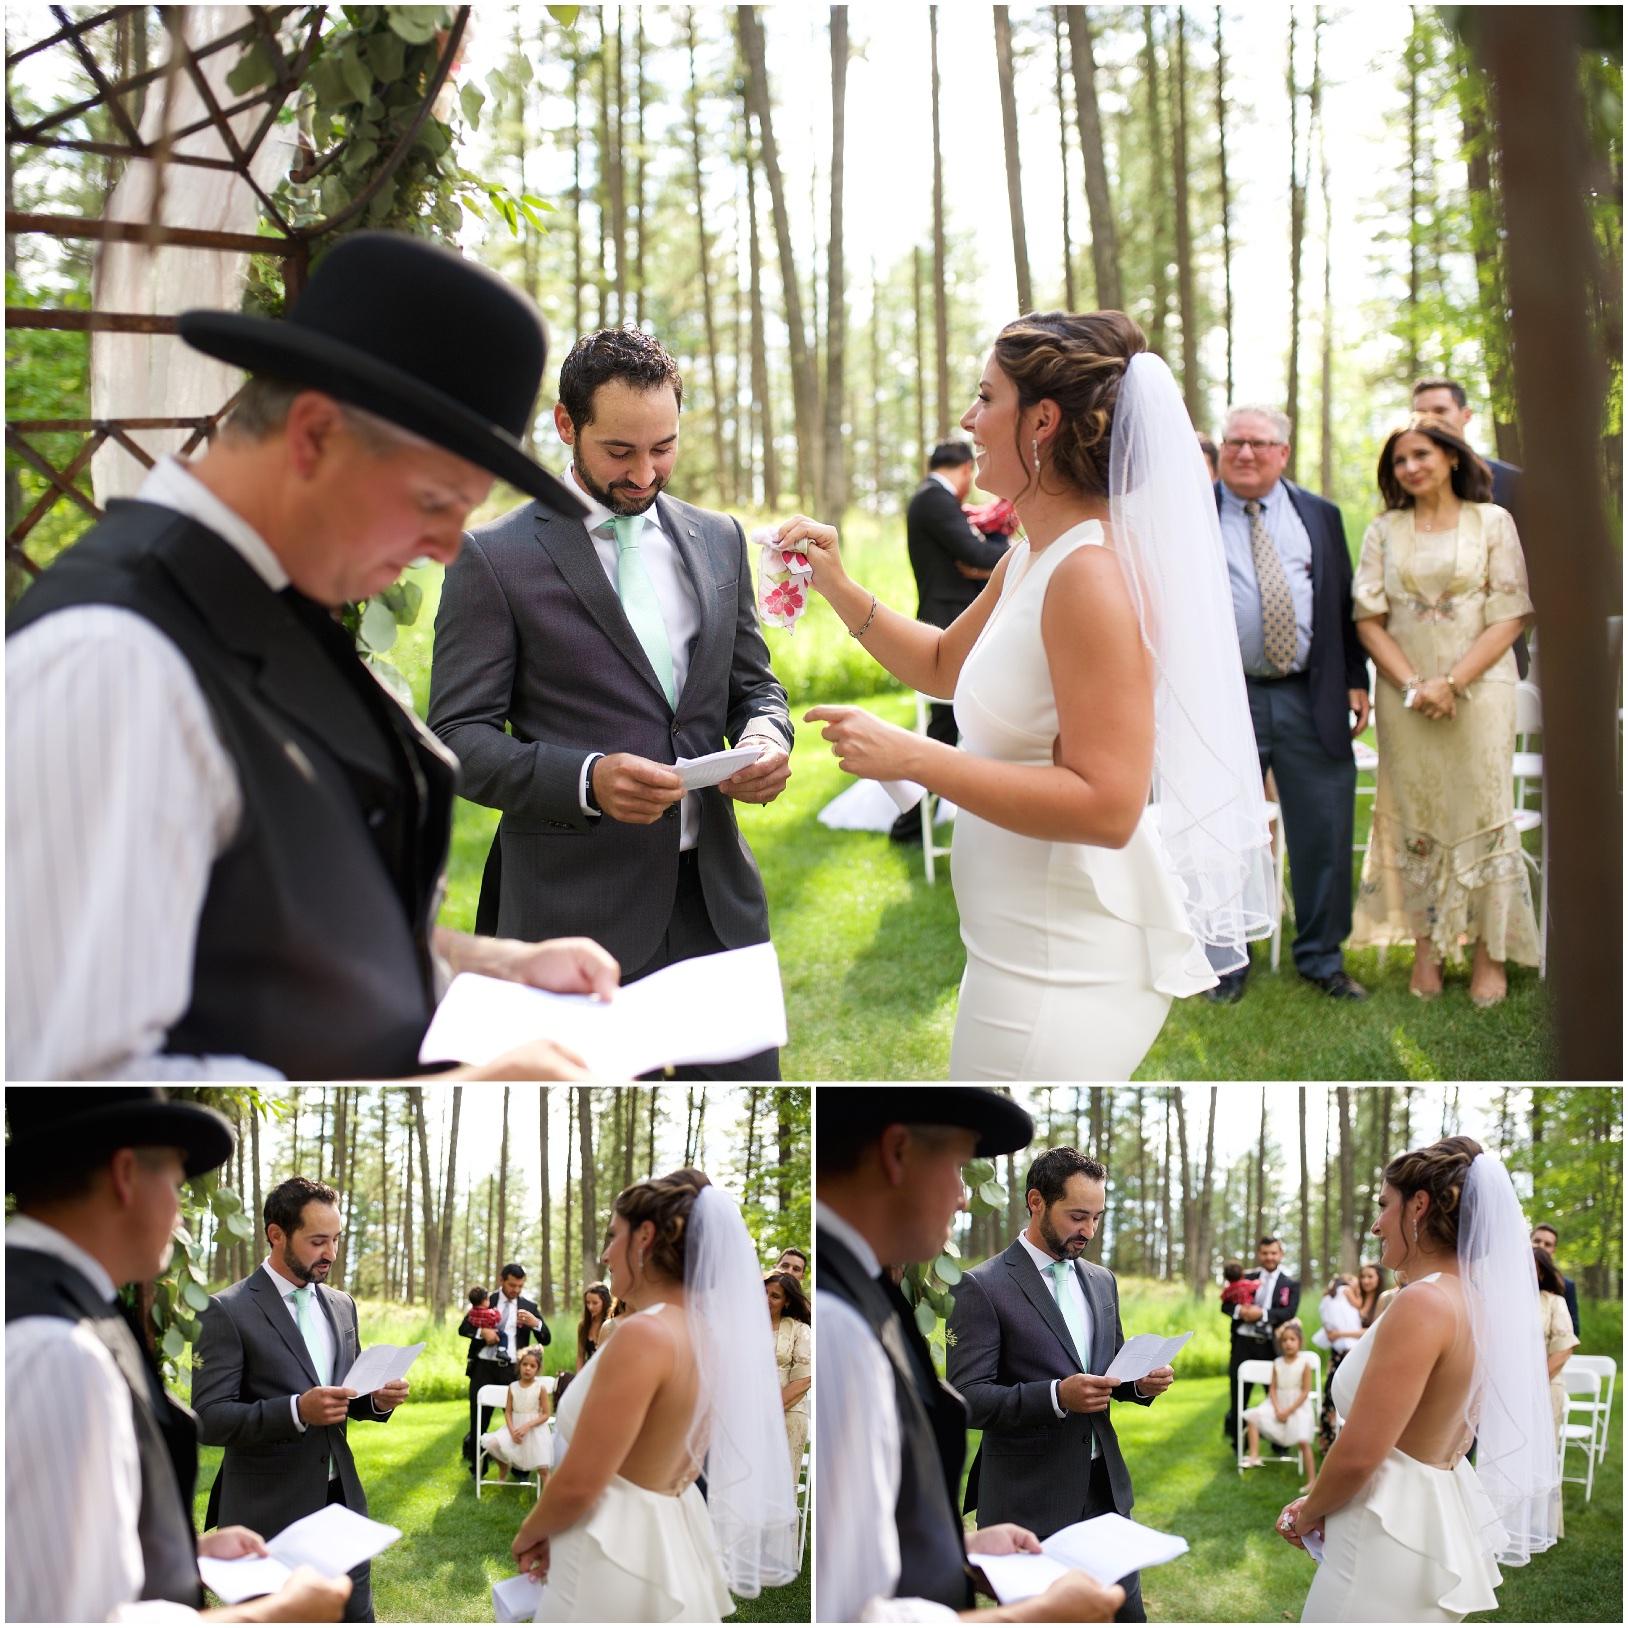 lindseyjane_wedding037.jpg